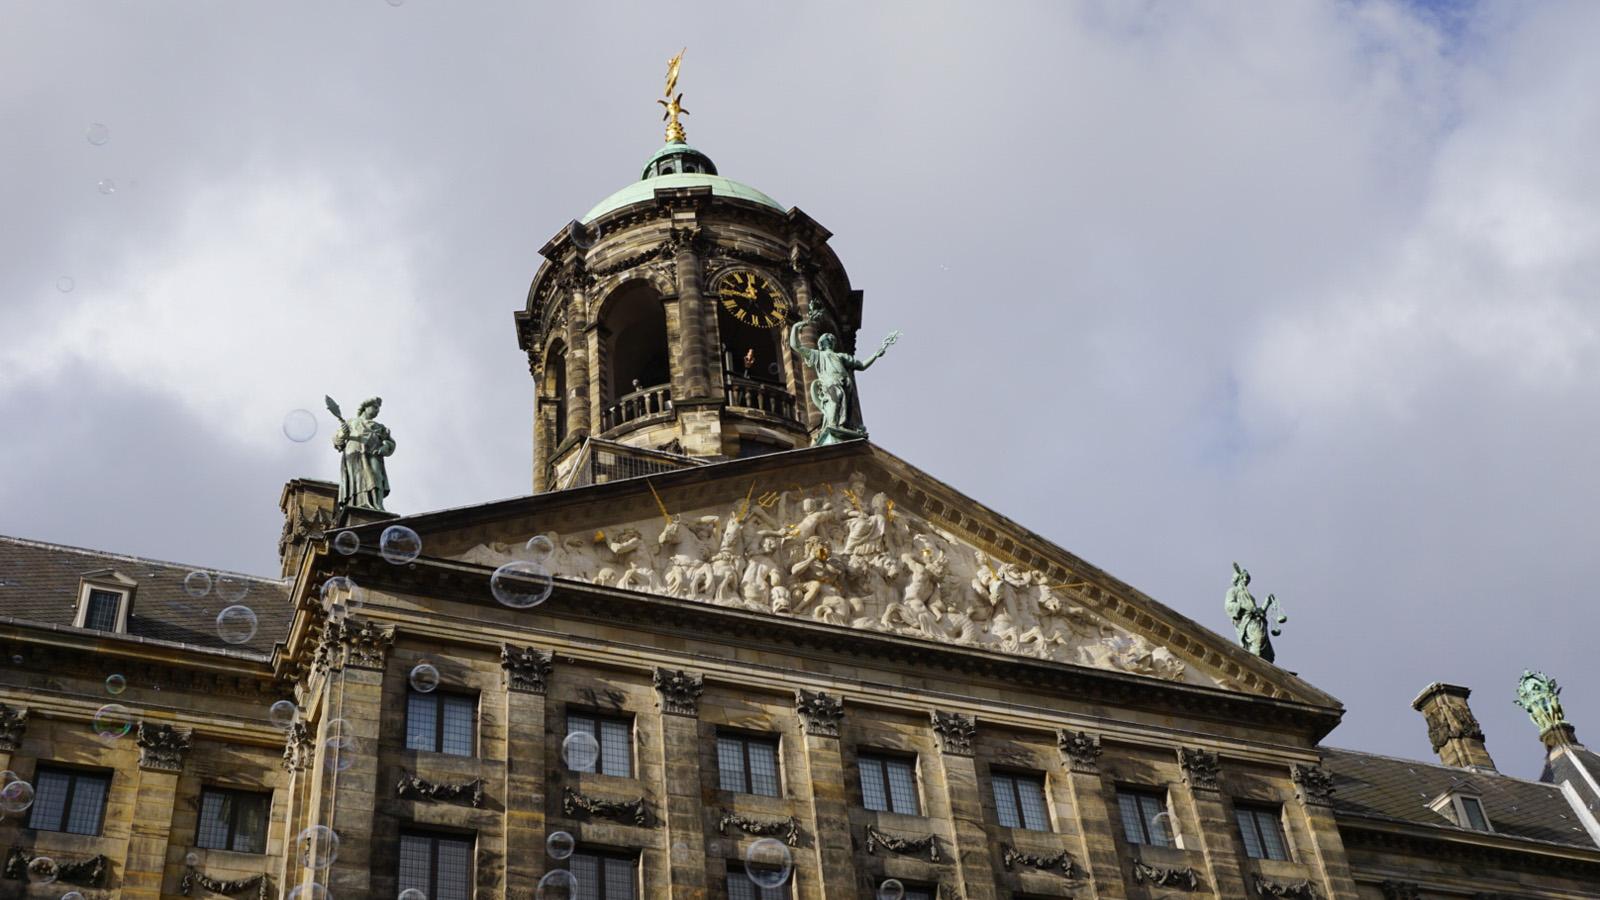 stadhuis-royal-palace-amsterdam-2-miniaturist